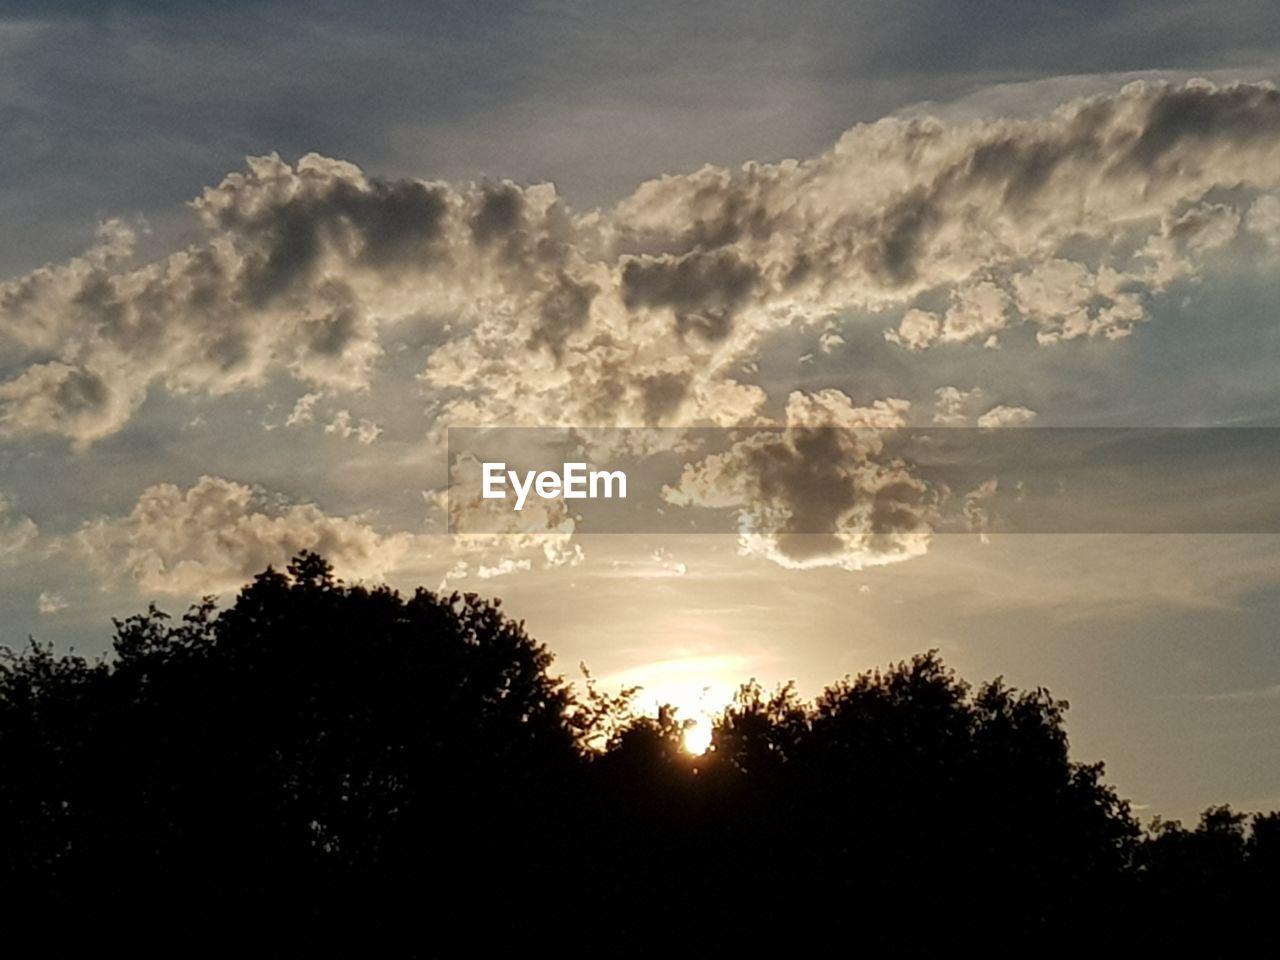 Tree Forest Silhouette Sunset Storm Cloud Defocused Sky Cloud - Sky Streaming Treetop Shining